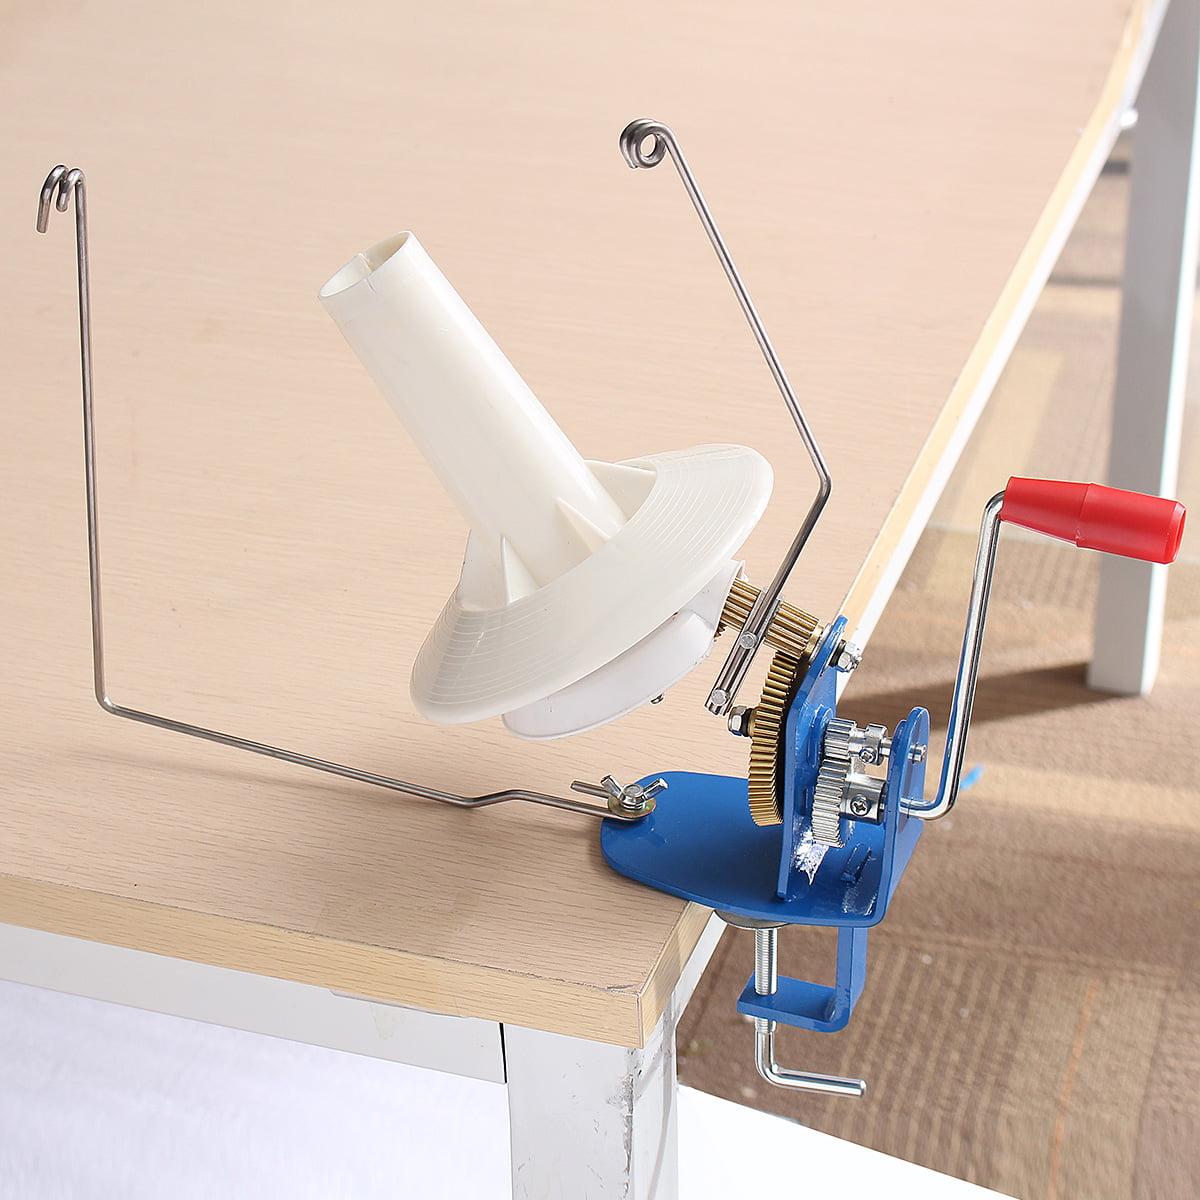 Heavy Duty Yarn Fiber Wool Ball Winder Hand Operated Needlecraft Winding Machine